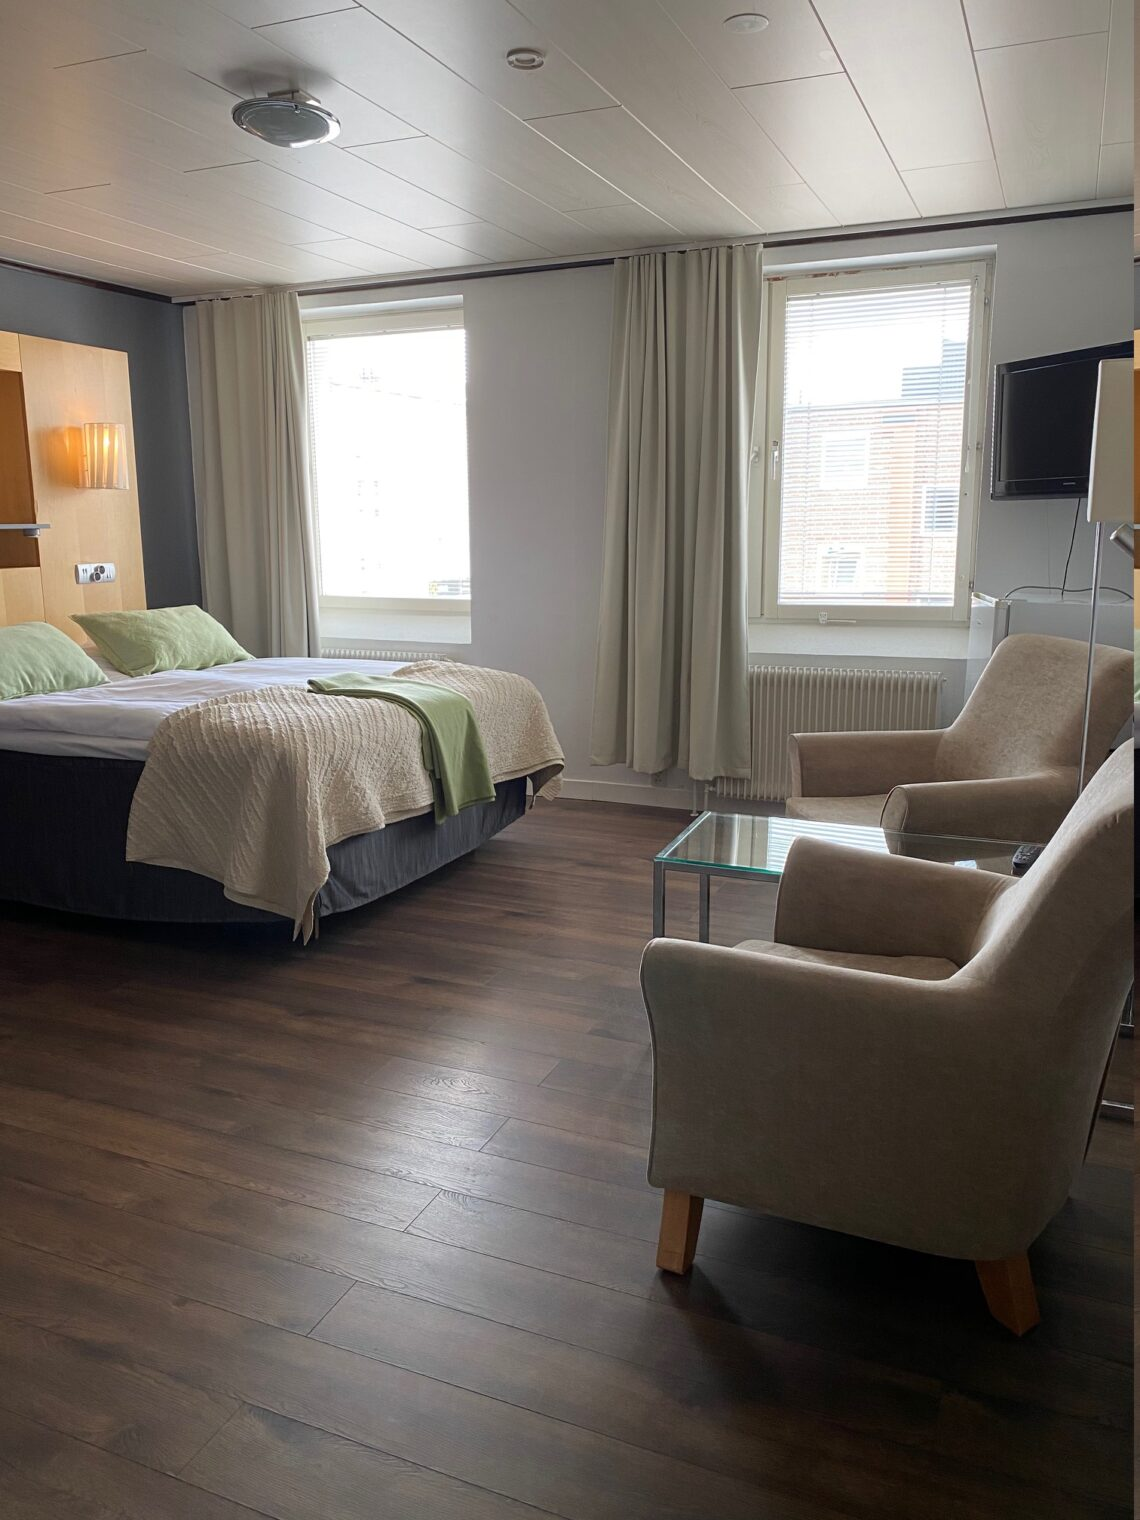 Våra rymlig rum på Strand City Hotell